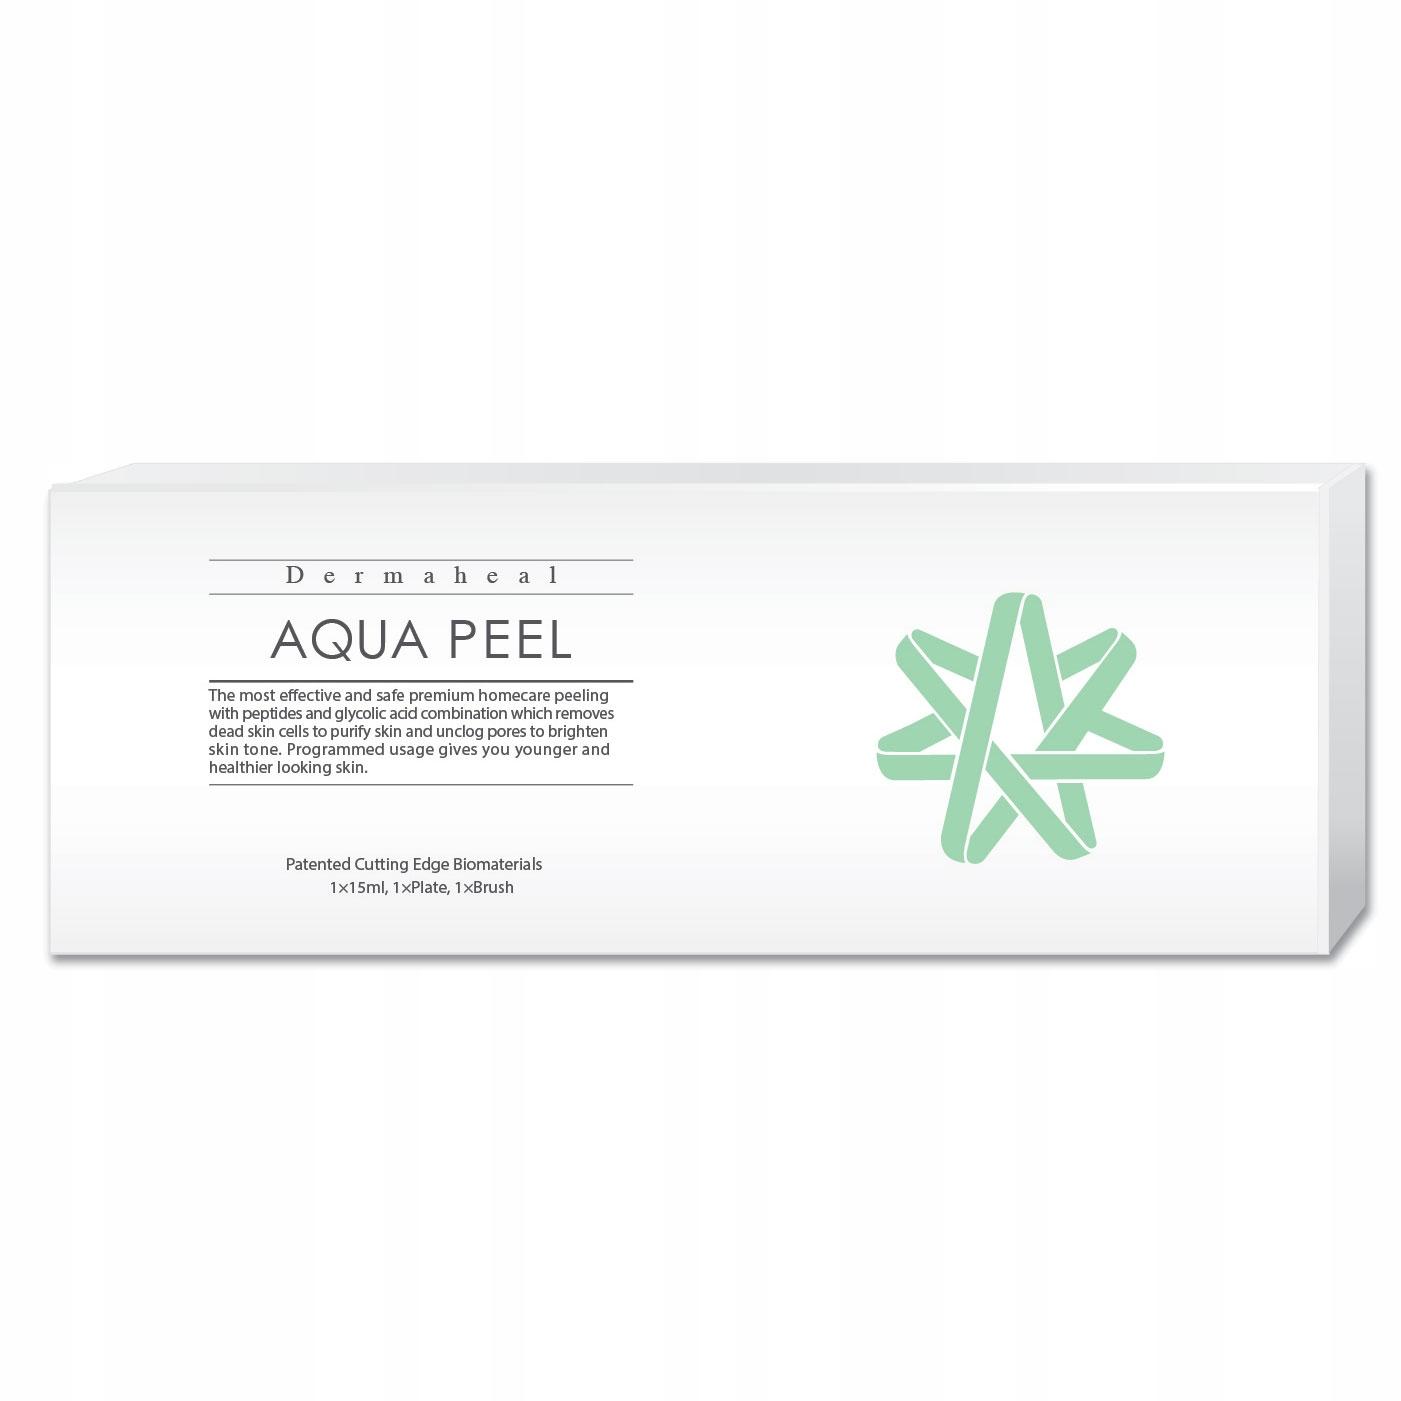 Dermahal Aqua Peel 15 ml